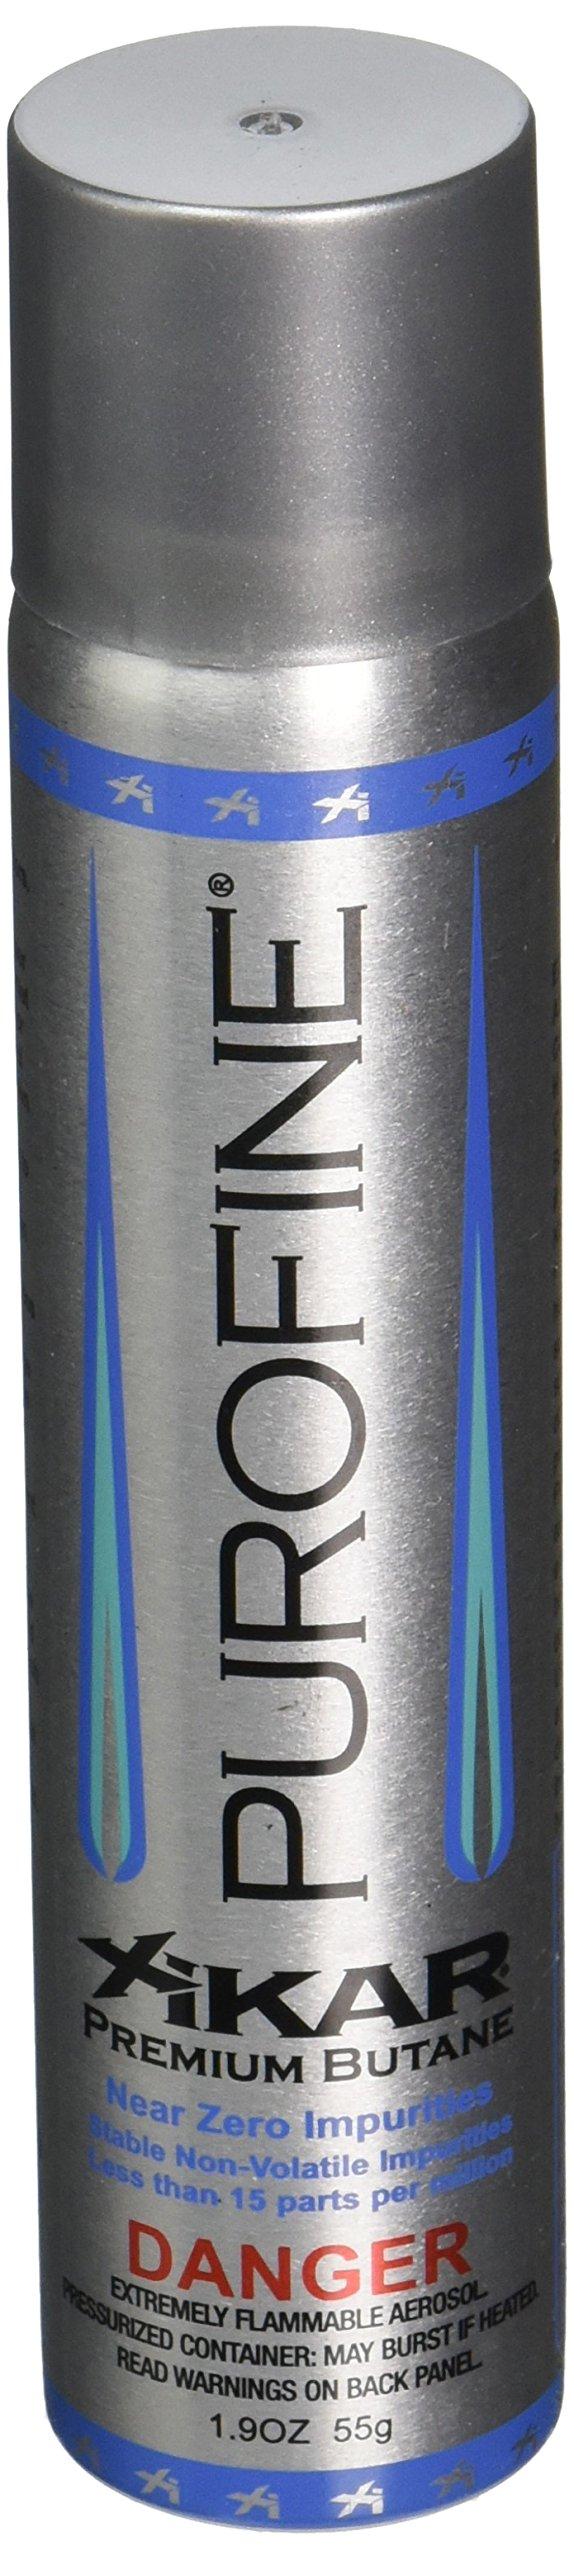 Xikar Premium Butane Fuel Refill for Lighters